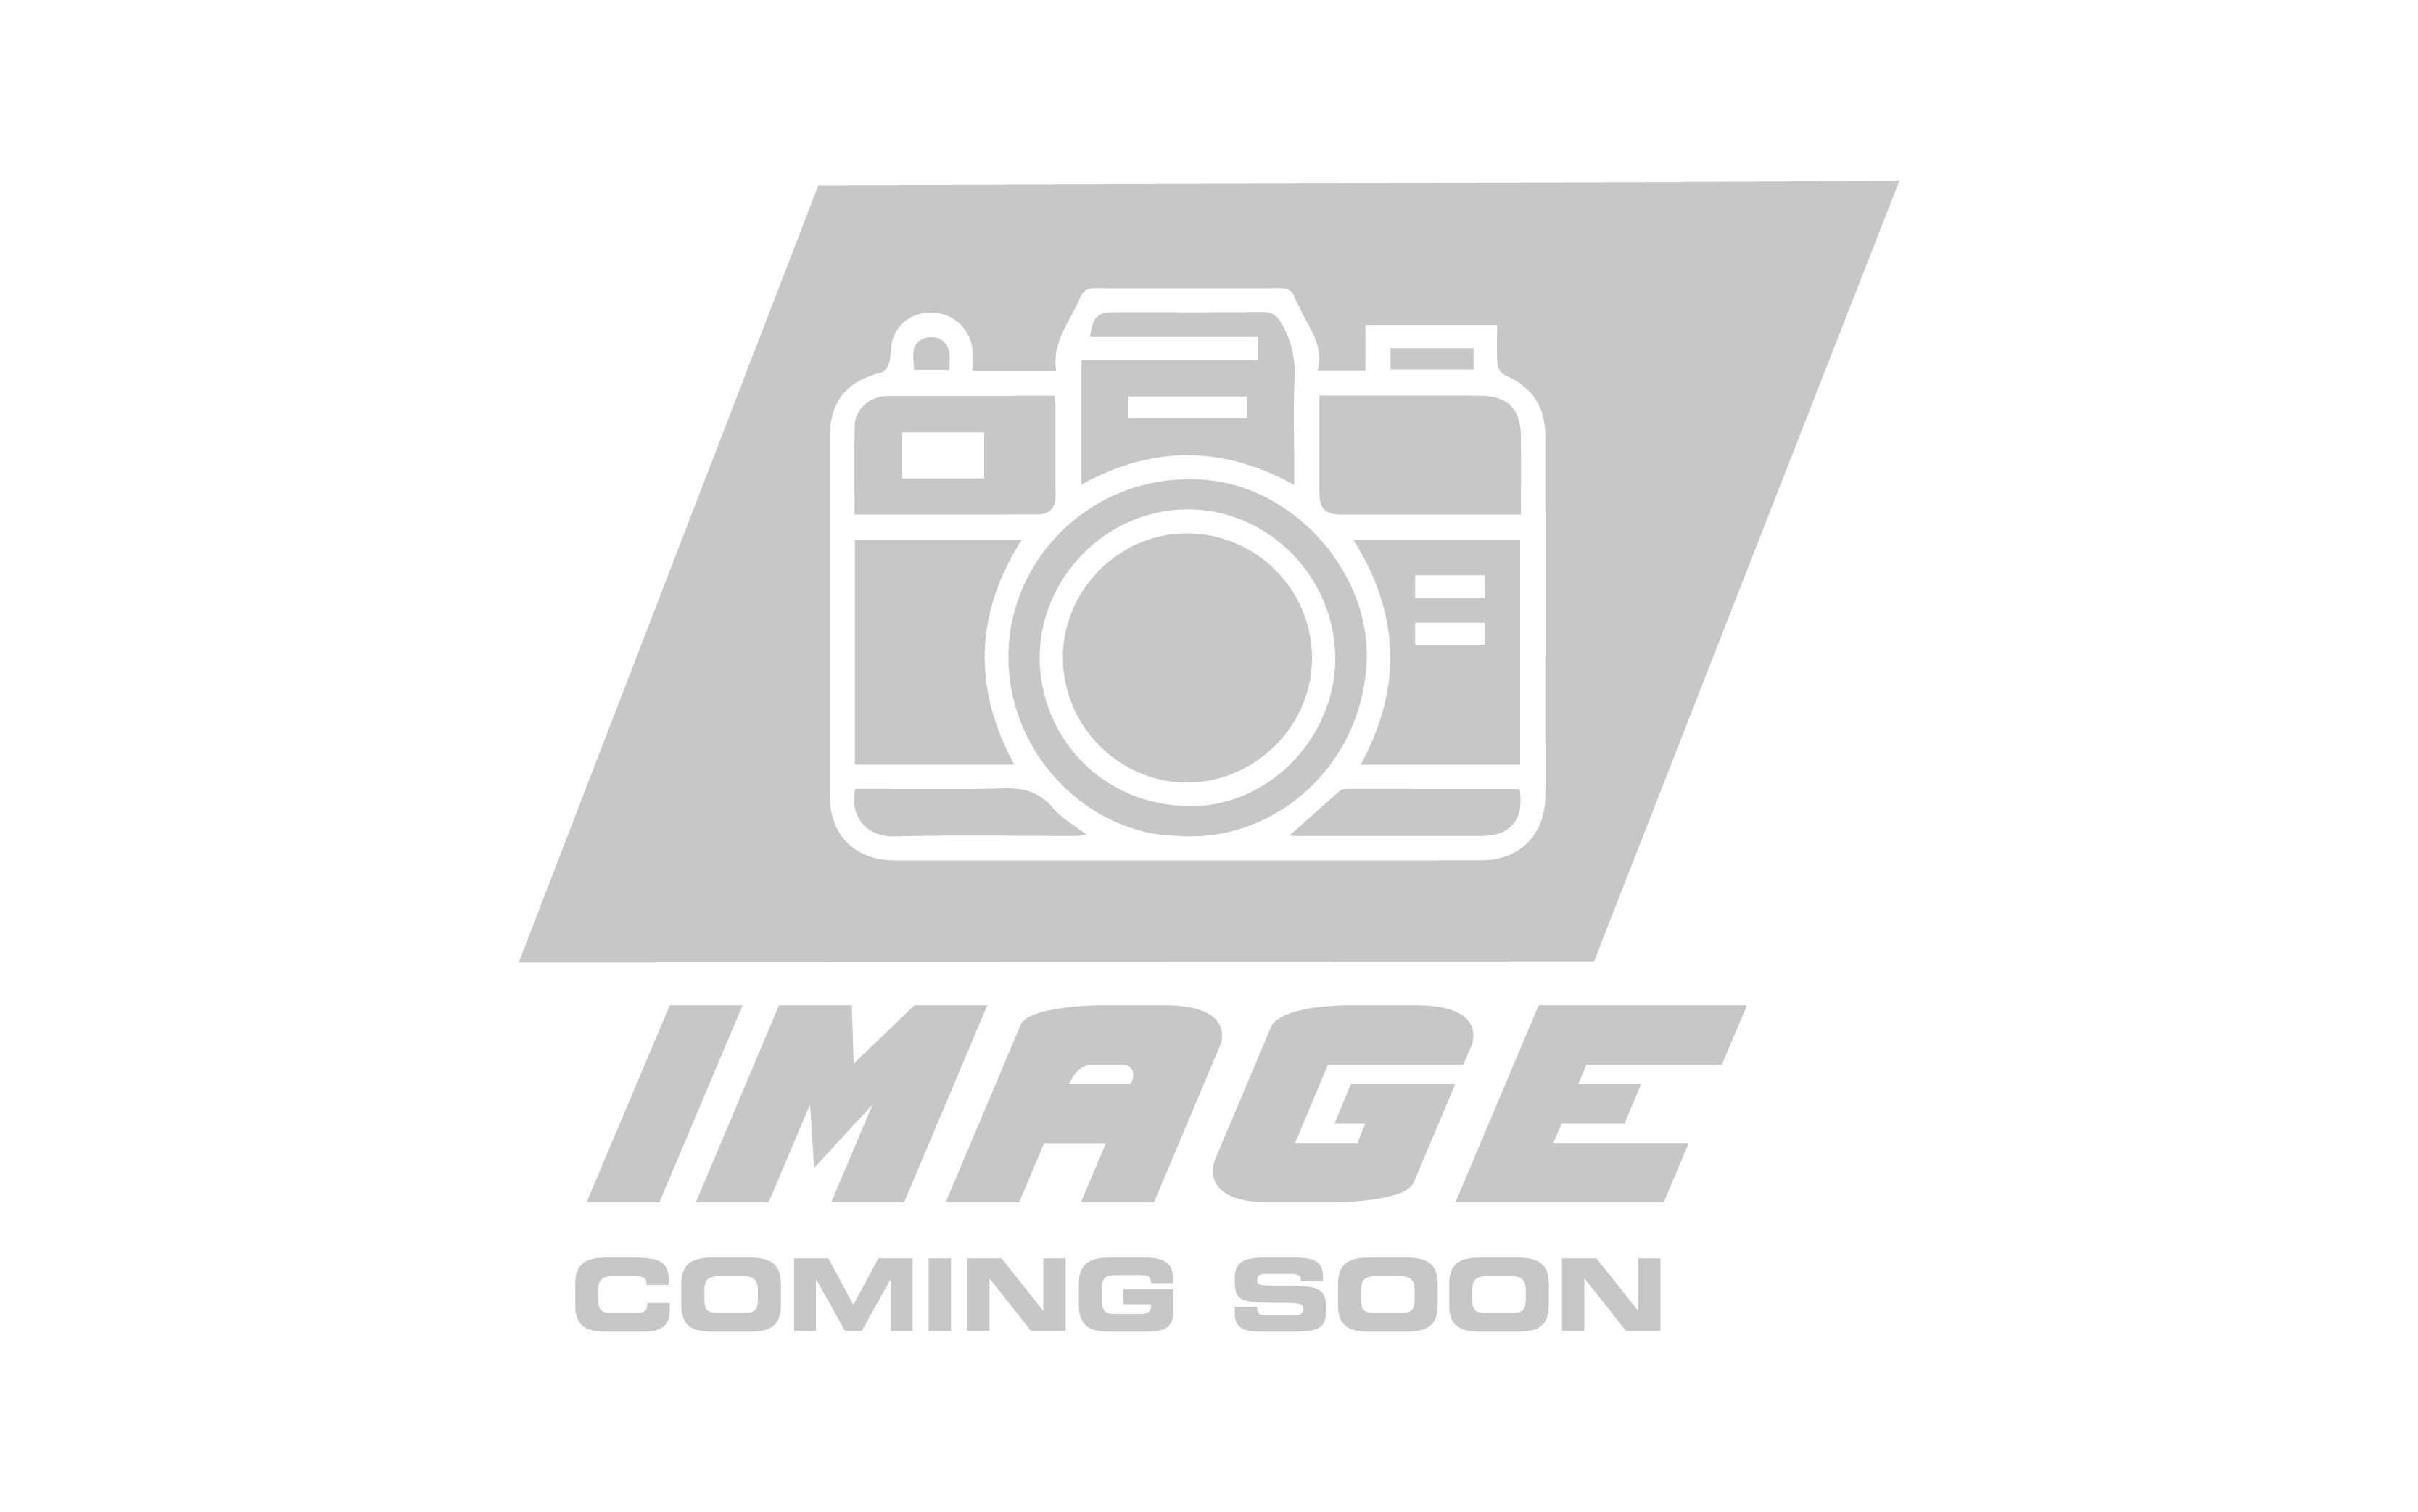 ford_f250_f350_f450_air_lift_loadlifter_5000_ultimate_bag_88399